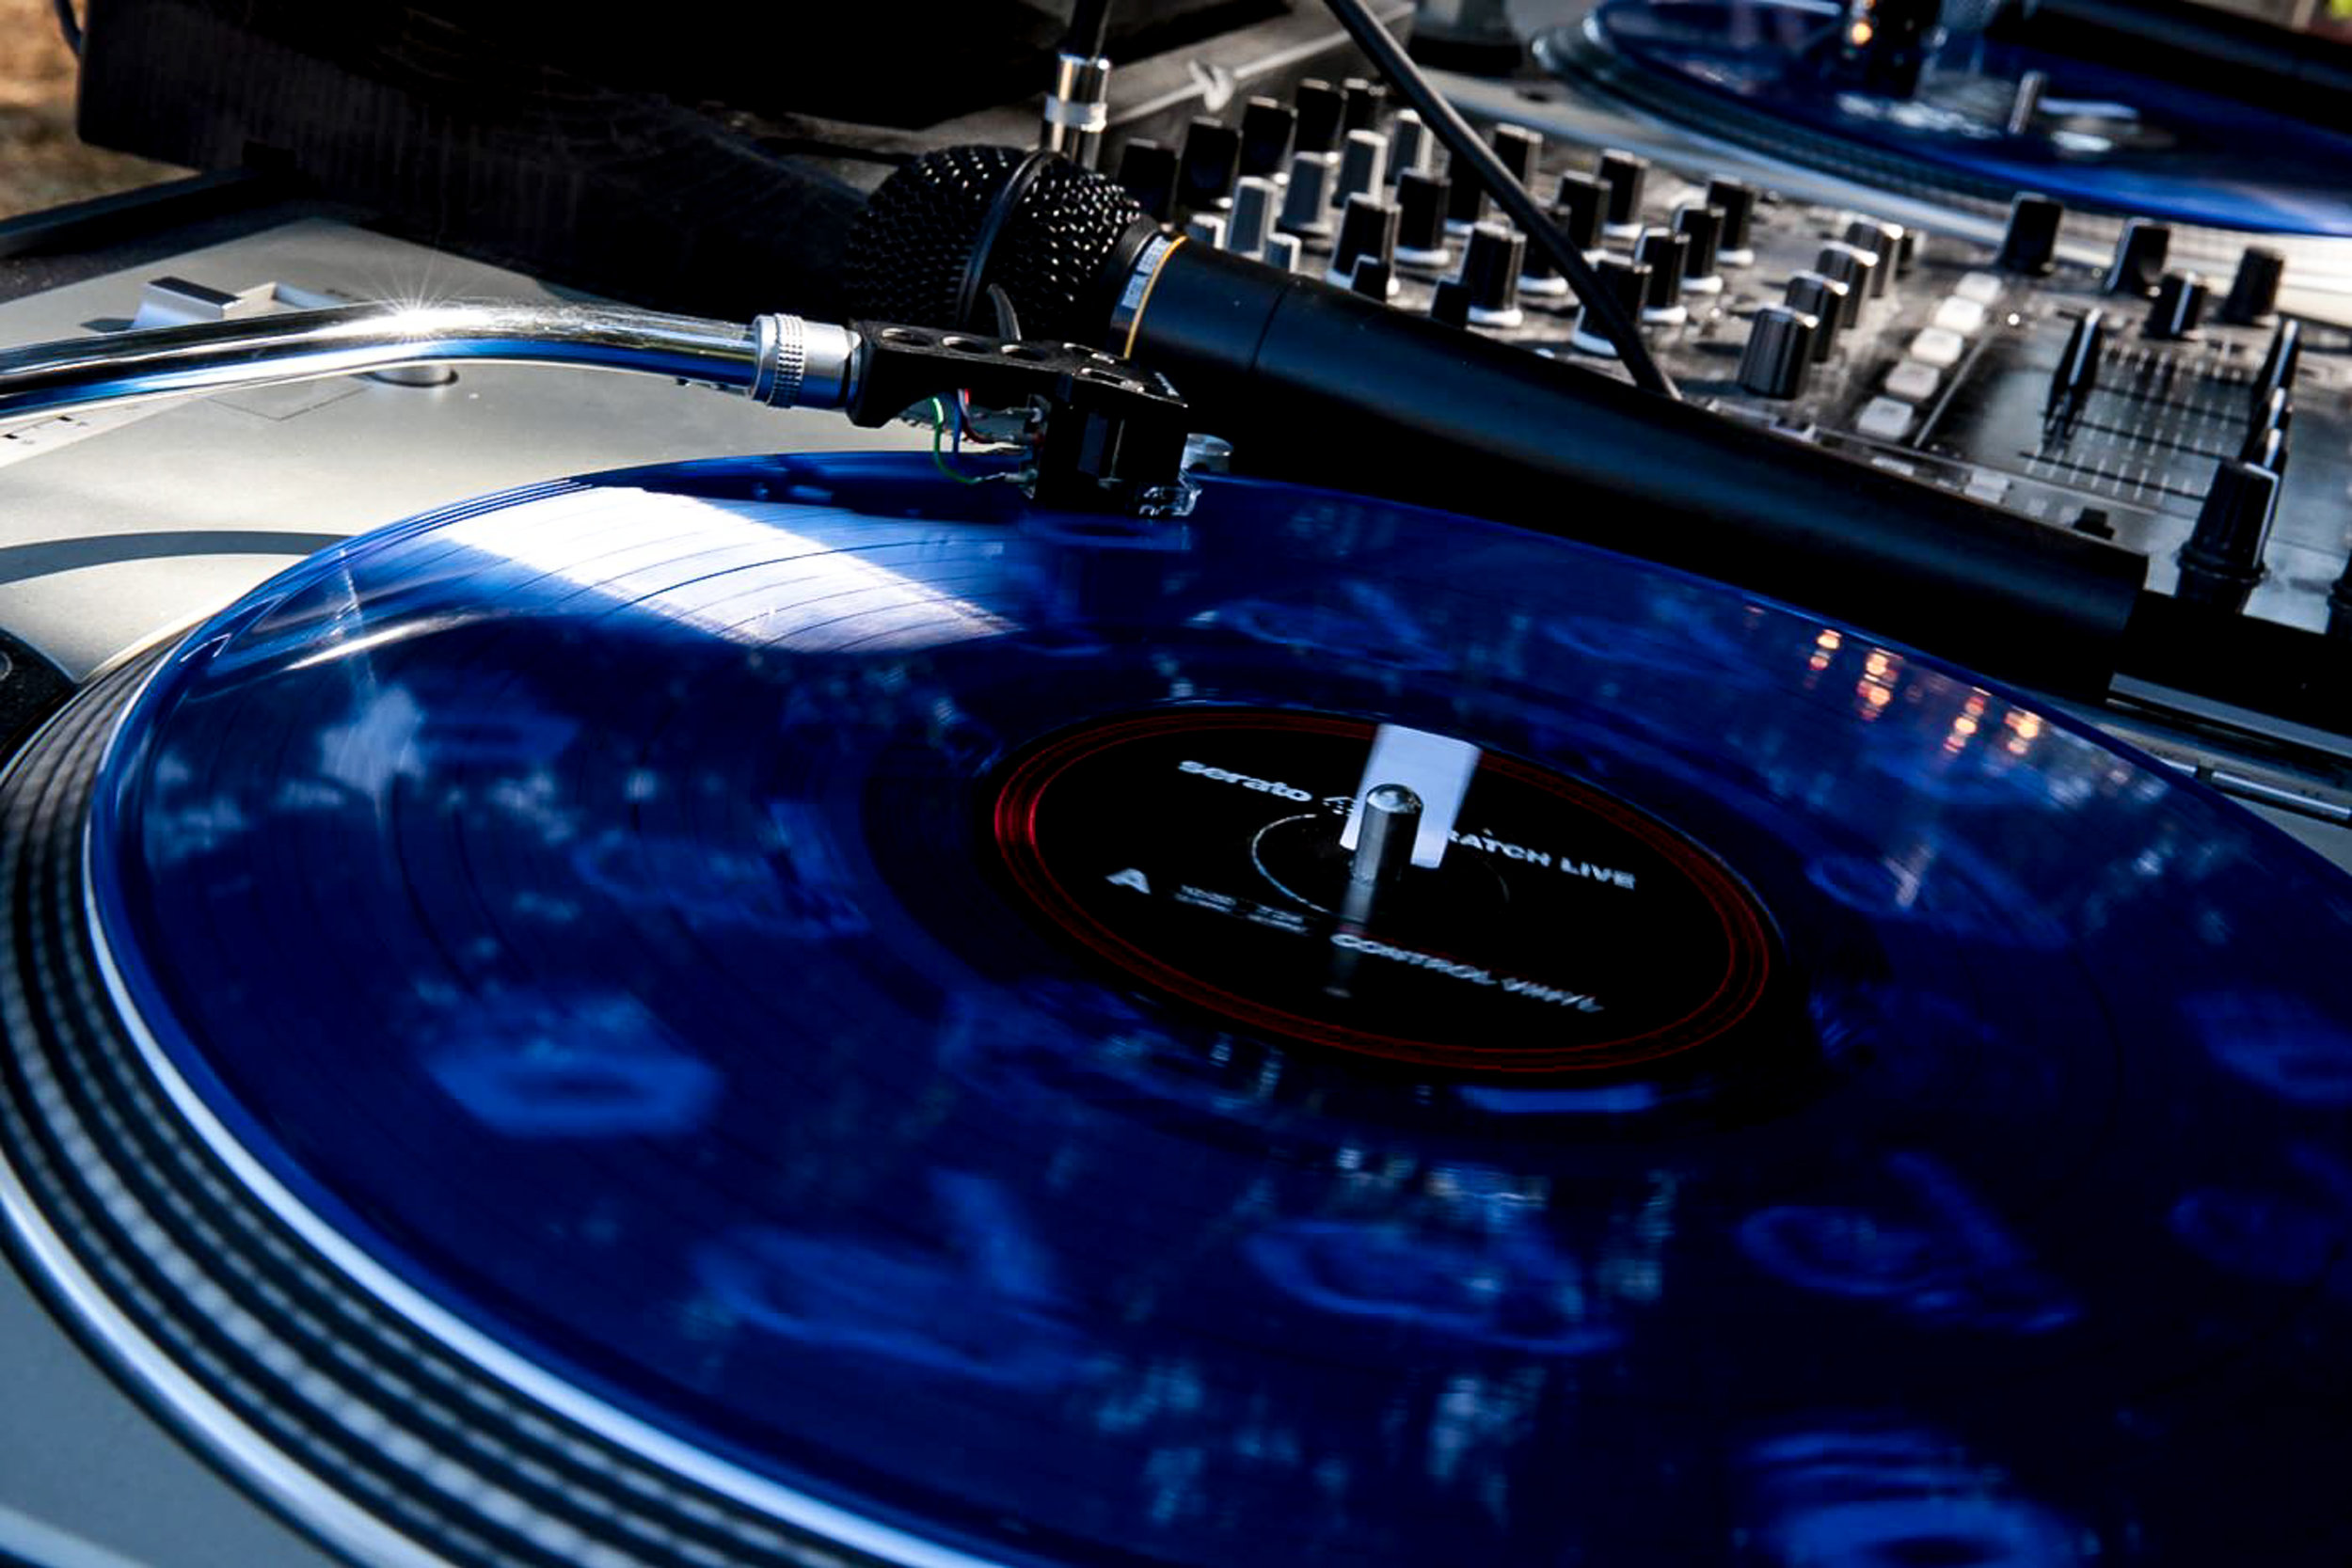 DJ Sound System Pic - Rane & Technics System.jpg